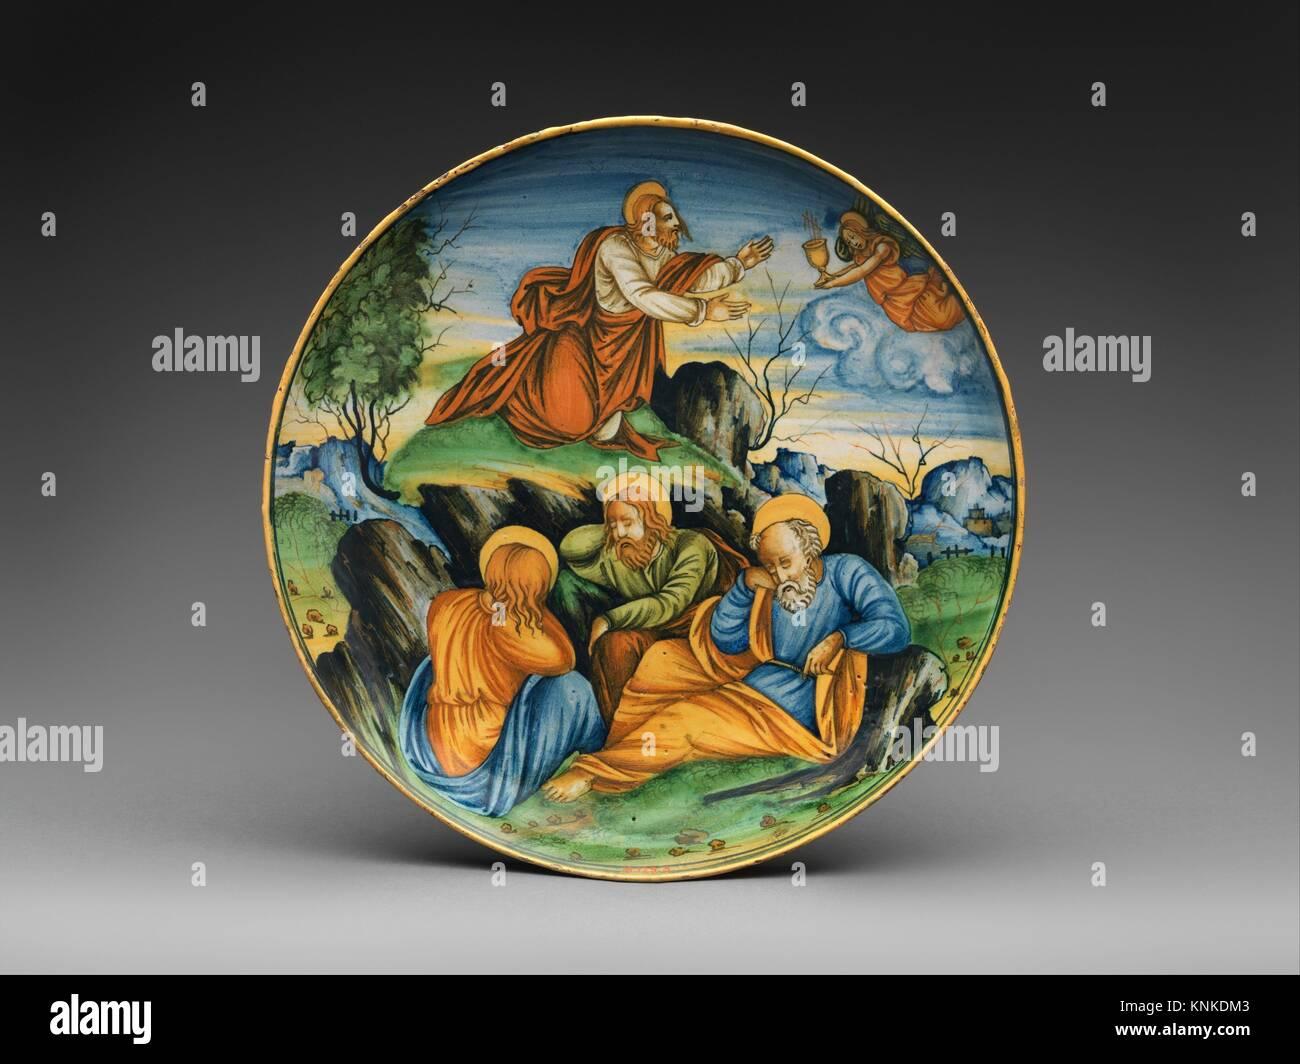 Shallow bowl with The Agony in the Garden. Artist: Baldassare Manara (Italian, Faenza, active first half 16th century) - Stock Image